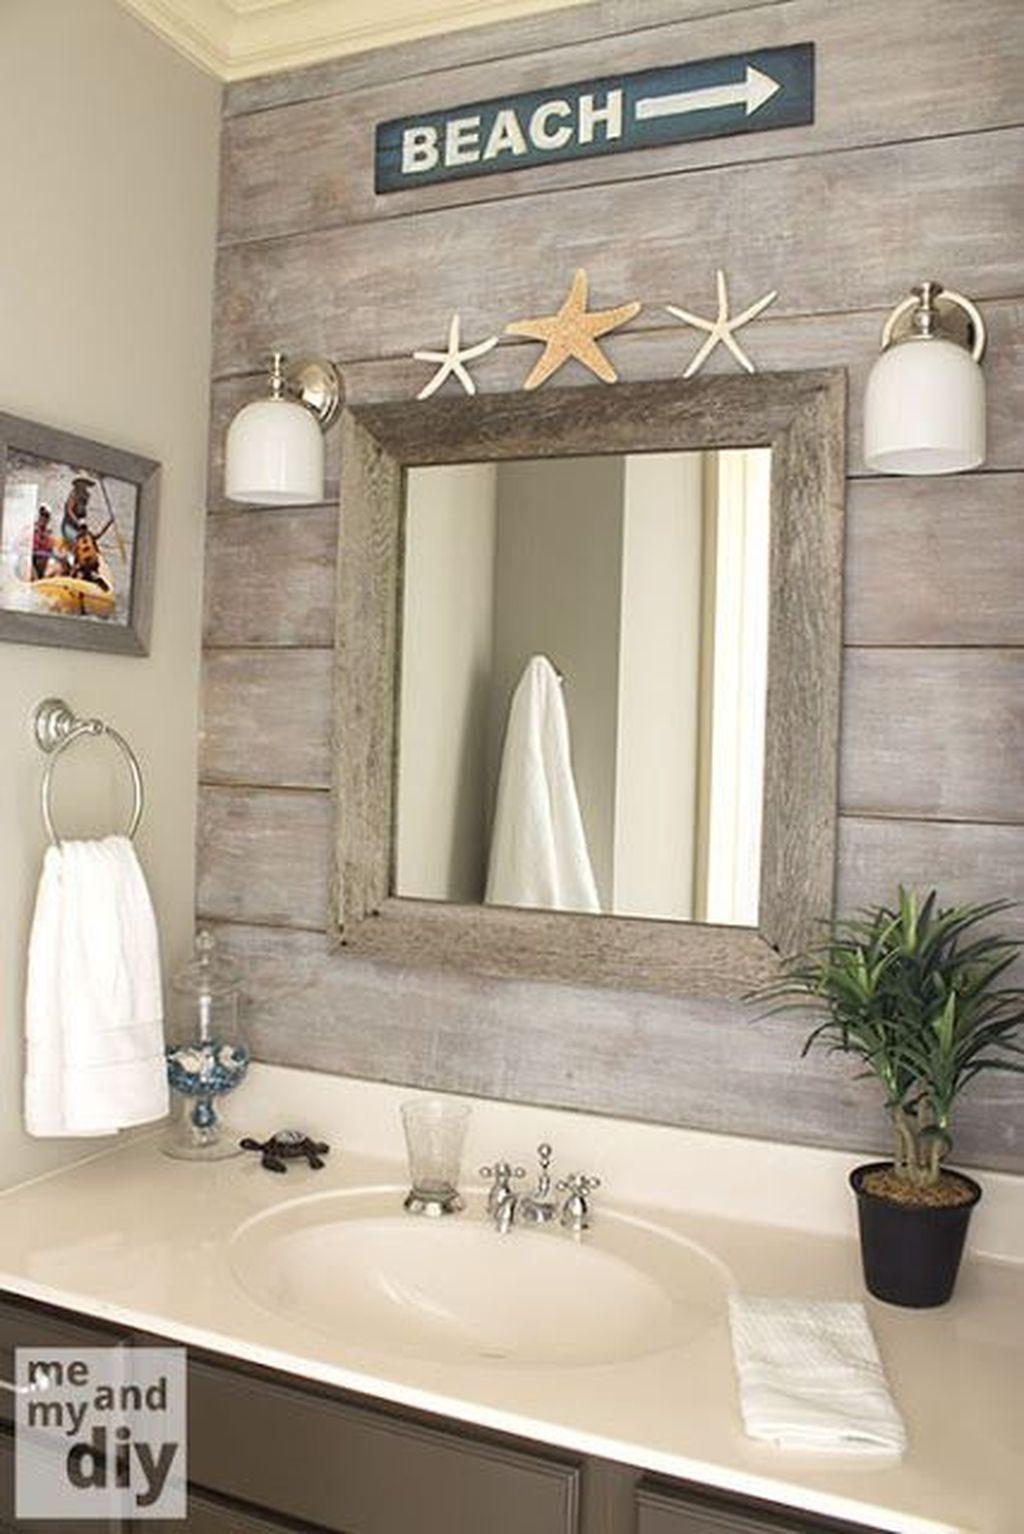 coastal bathroom vanities ideas on foter rh foter com modern coastal bathroom vanity coastal living bathroom vanity